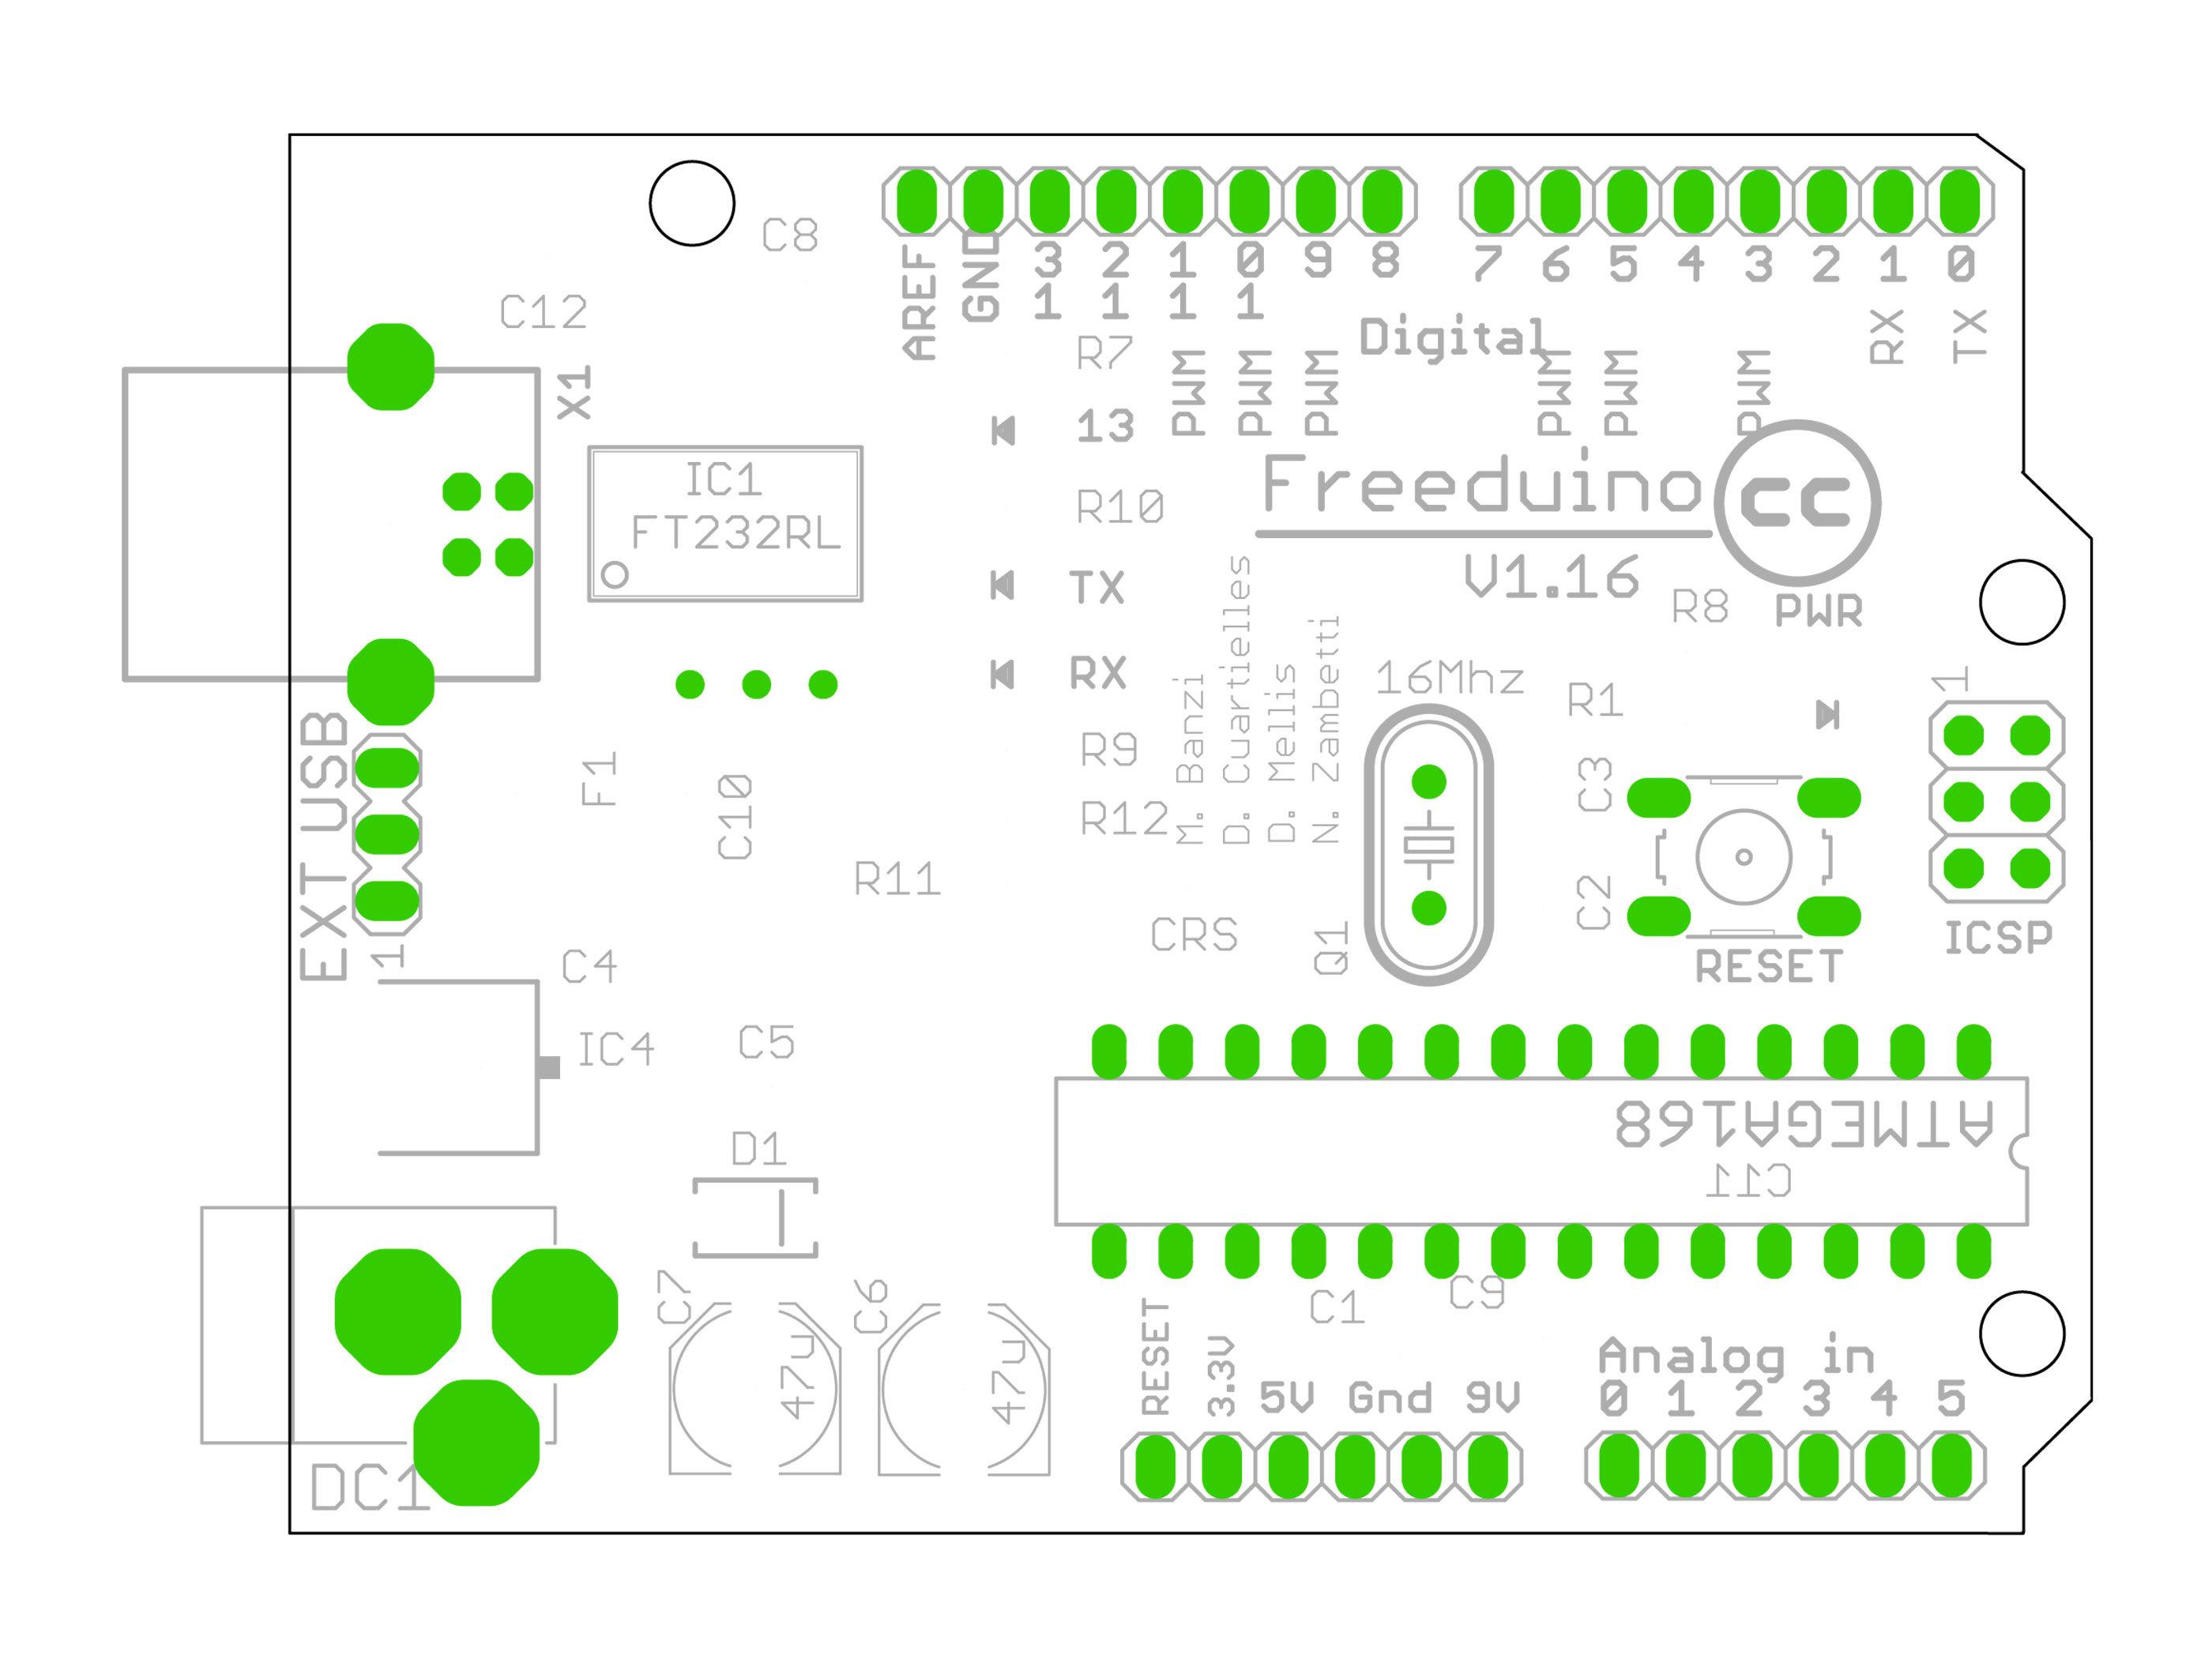 Introductory Circuit Design Process usingFreeduino